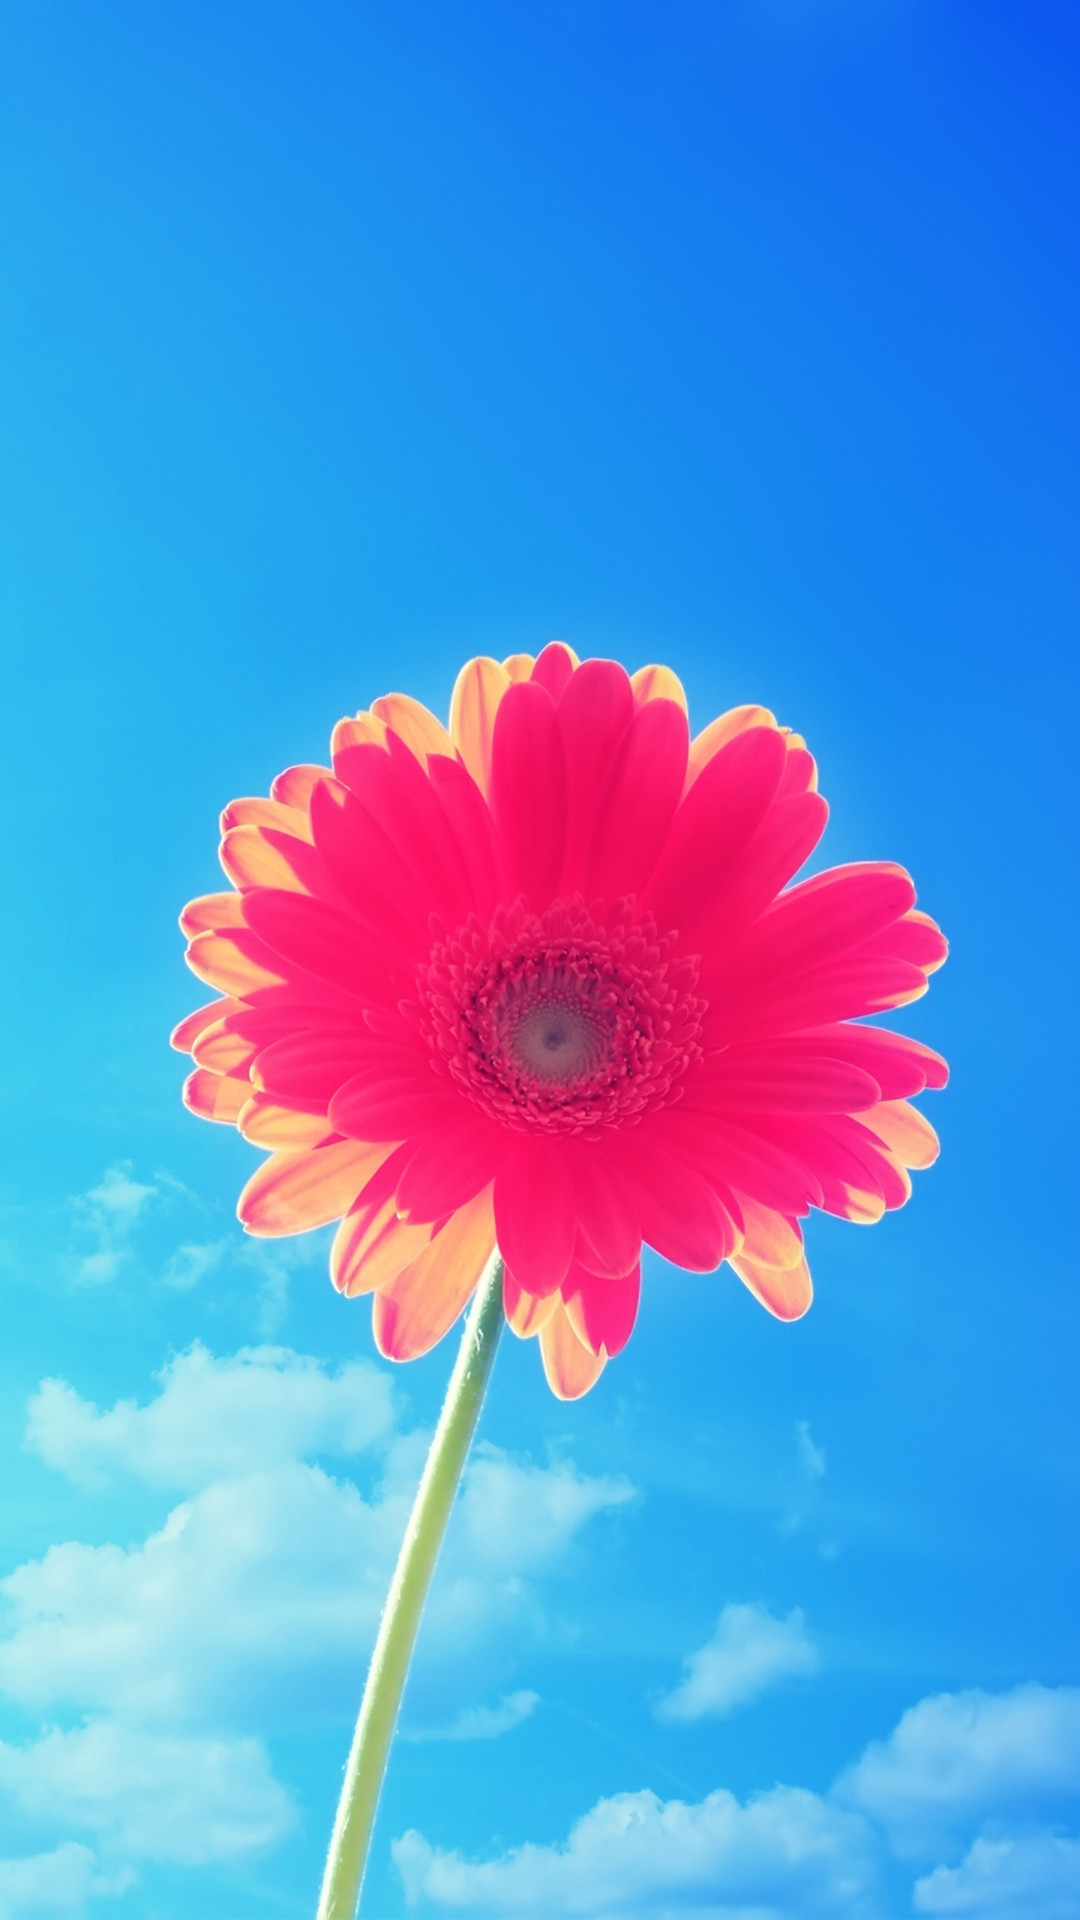 Pink Flower Blue Sky iPhone 6 Plus HD Wallpaper …